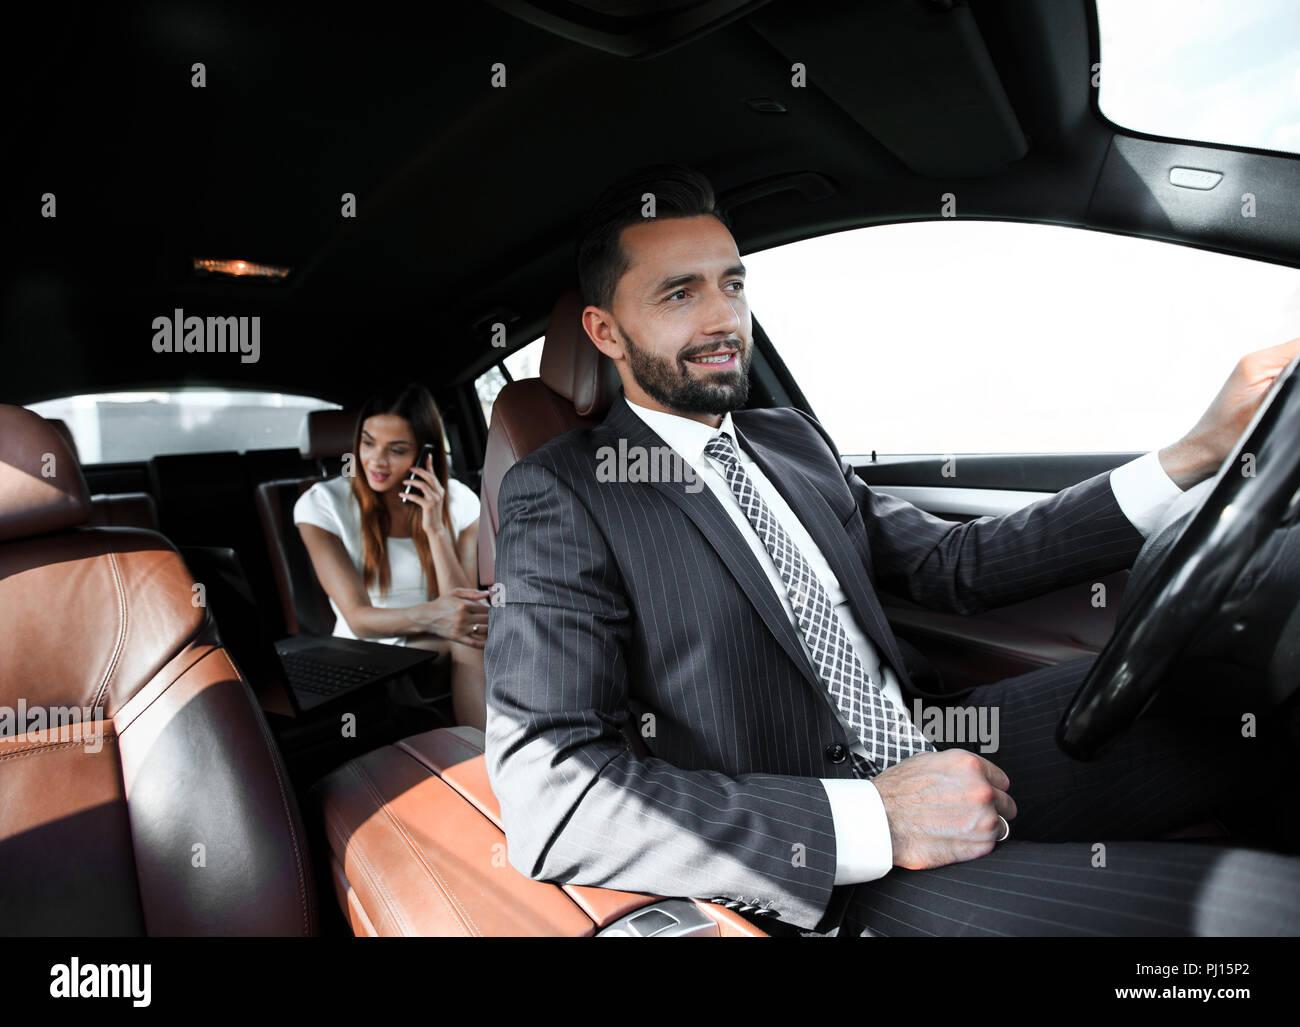 Attractive elegant serious man drives good car - Stock Image